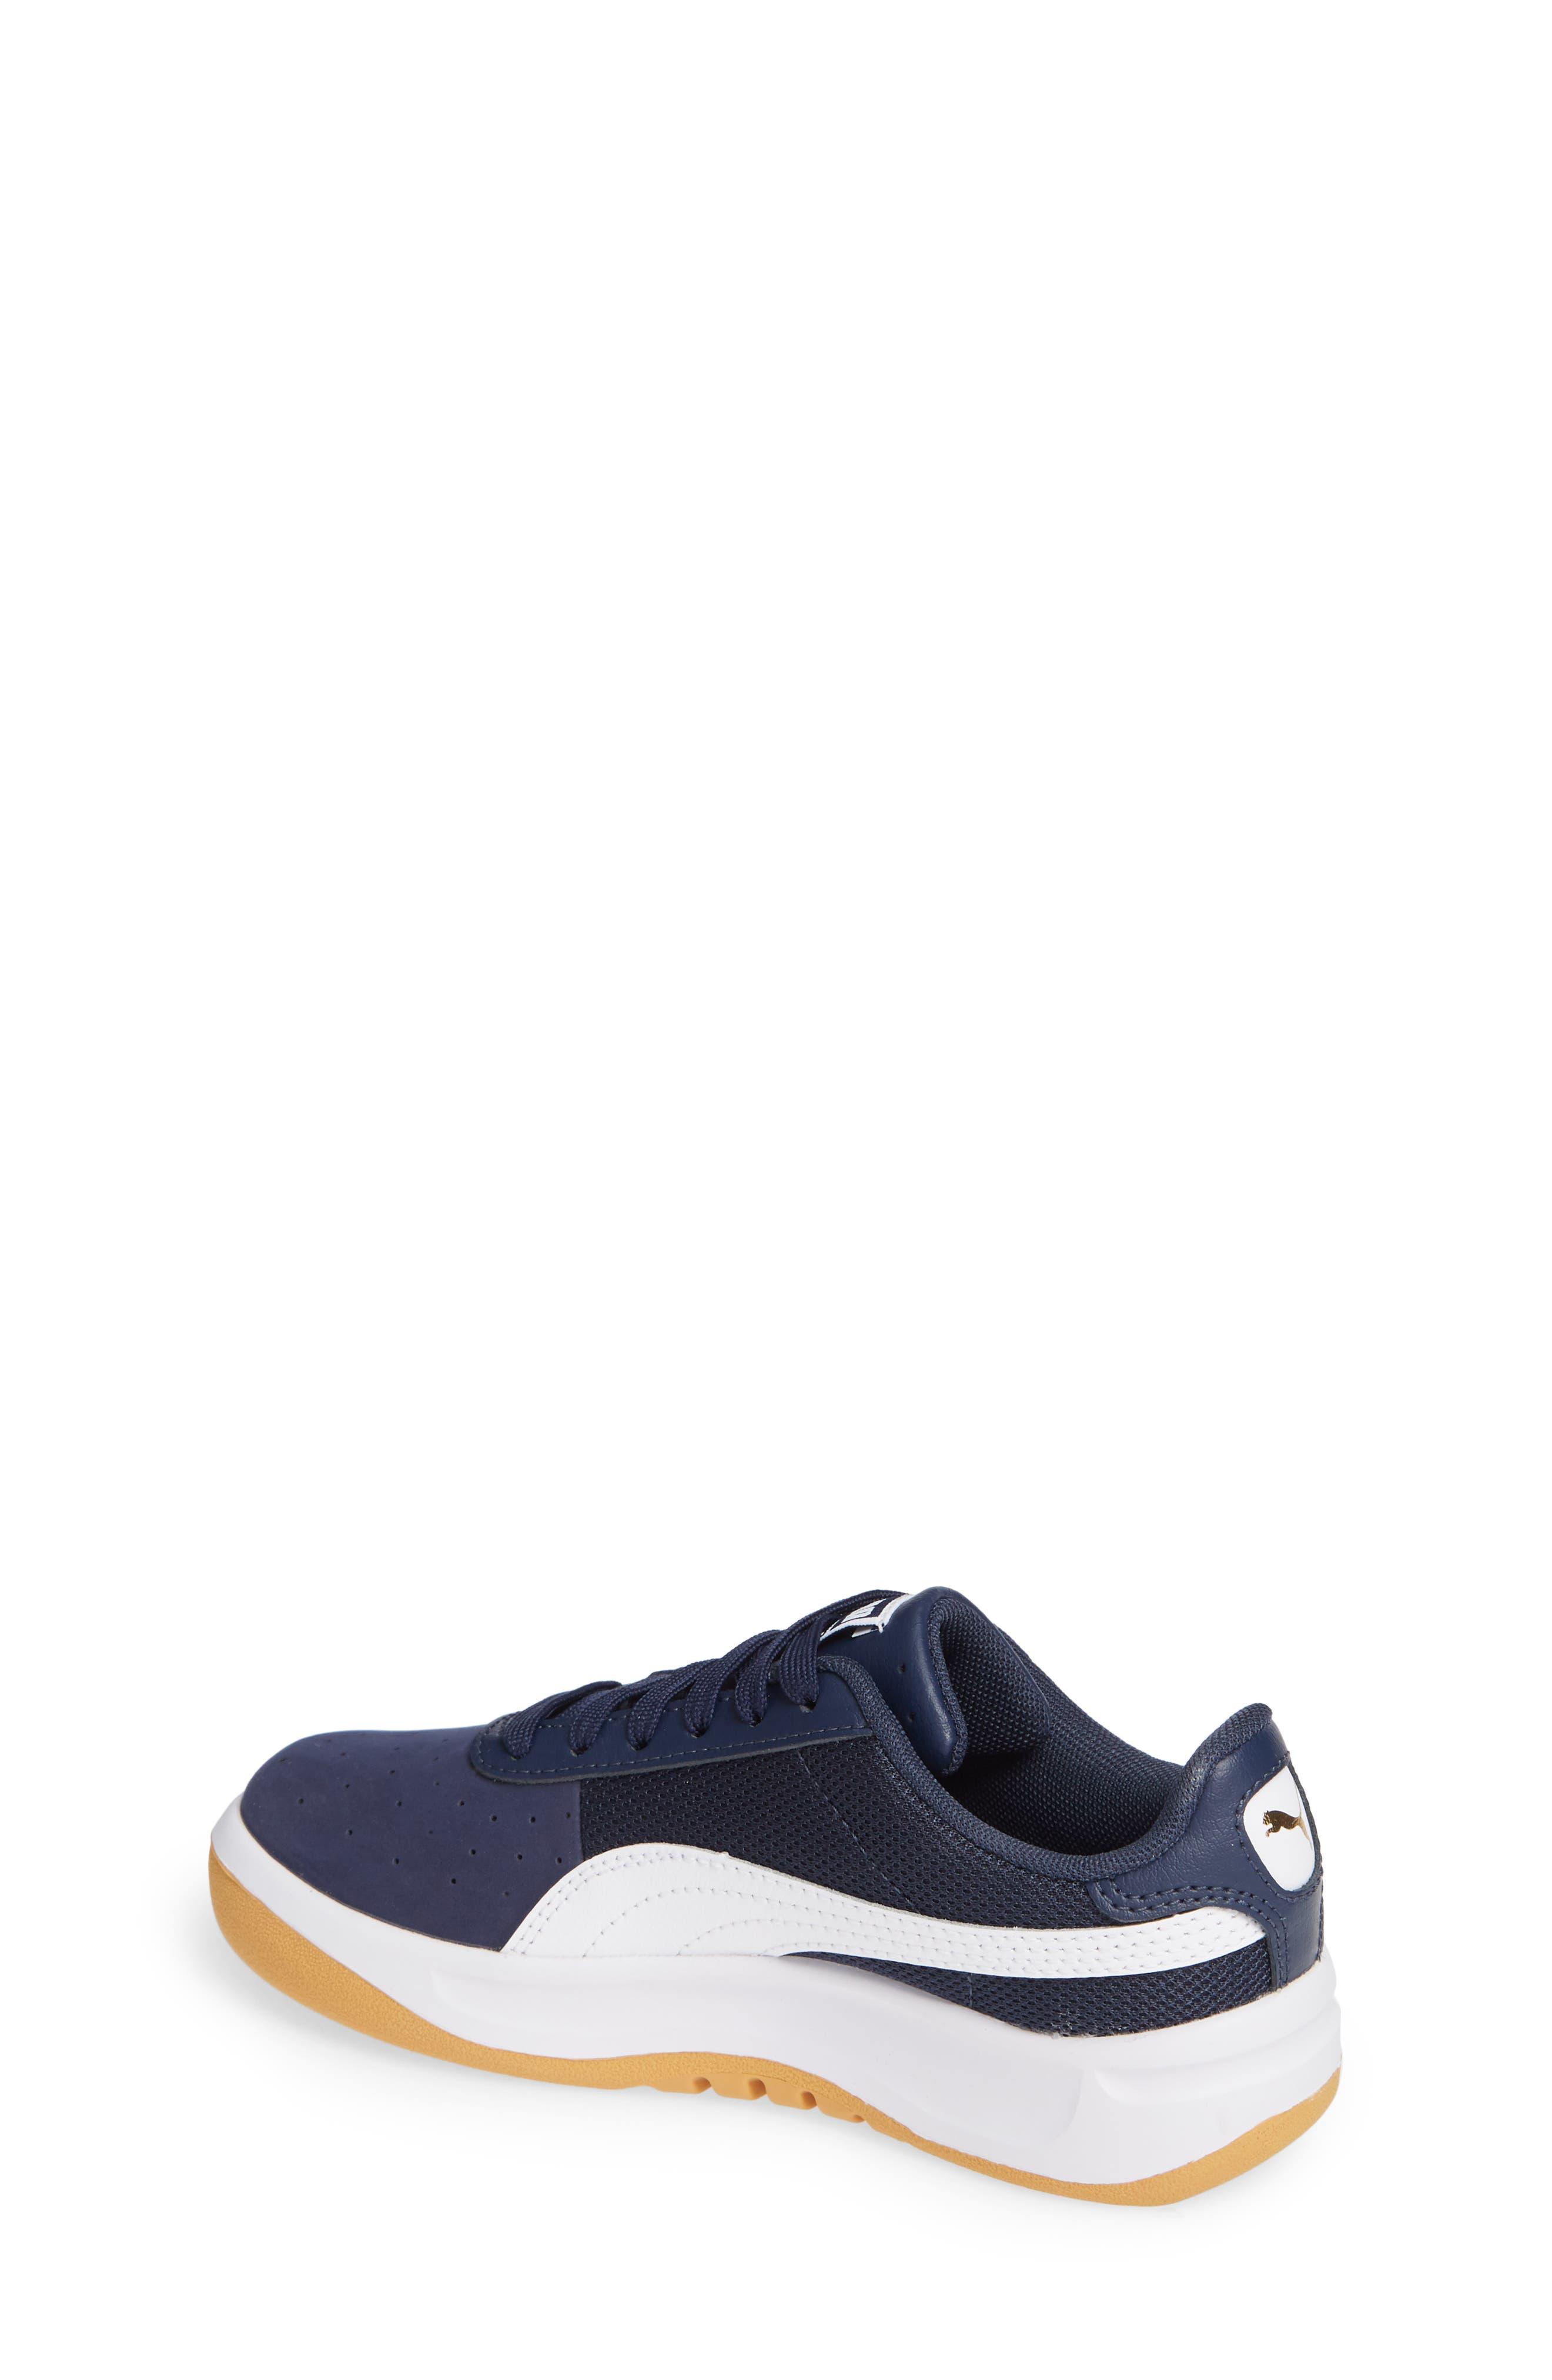 California Casual Jr. Sneaker,                             Alternate thumbnail 2, color,                             PEACOAT-PUMA WHITE-GOLD